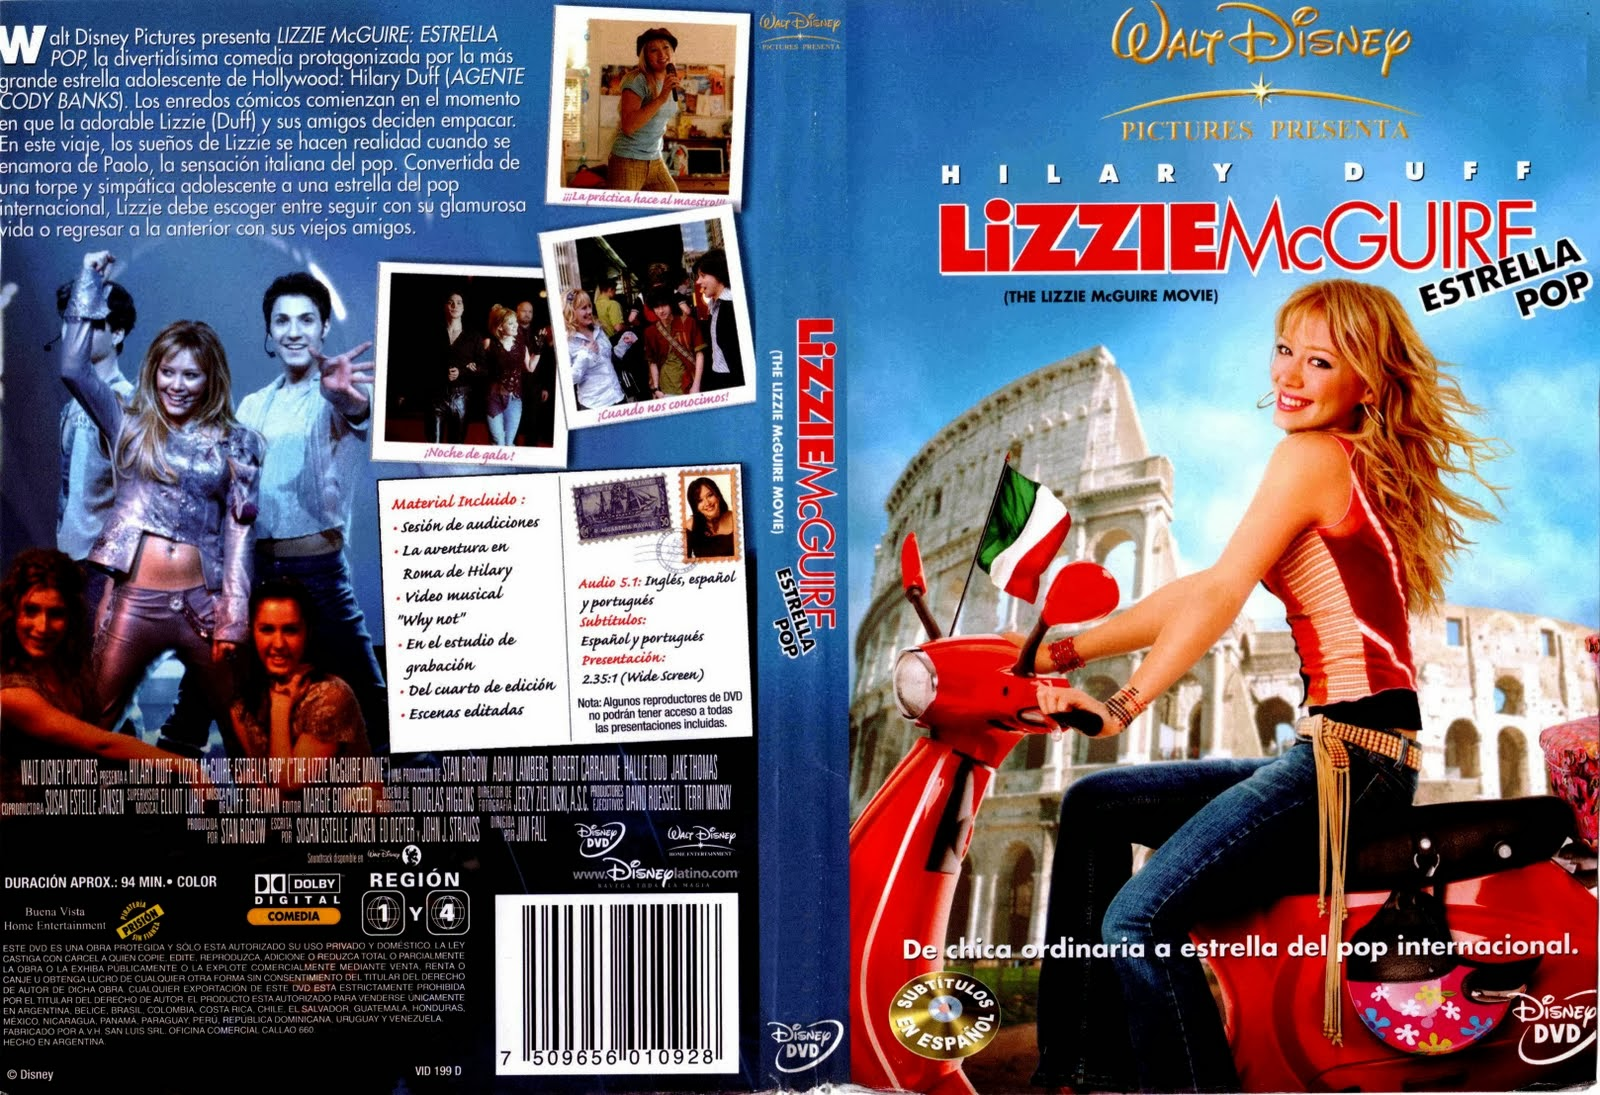 the lizzie mcguire movie pelicula completa español